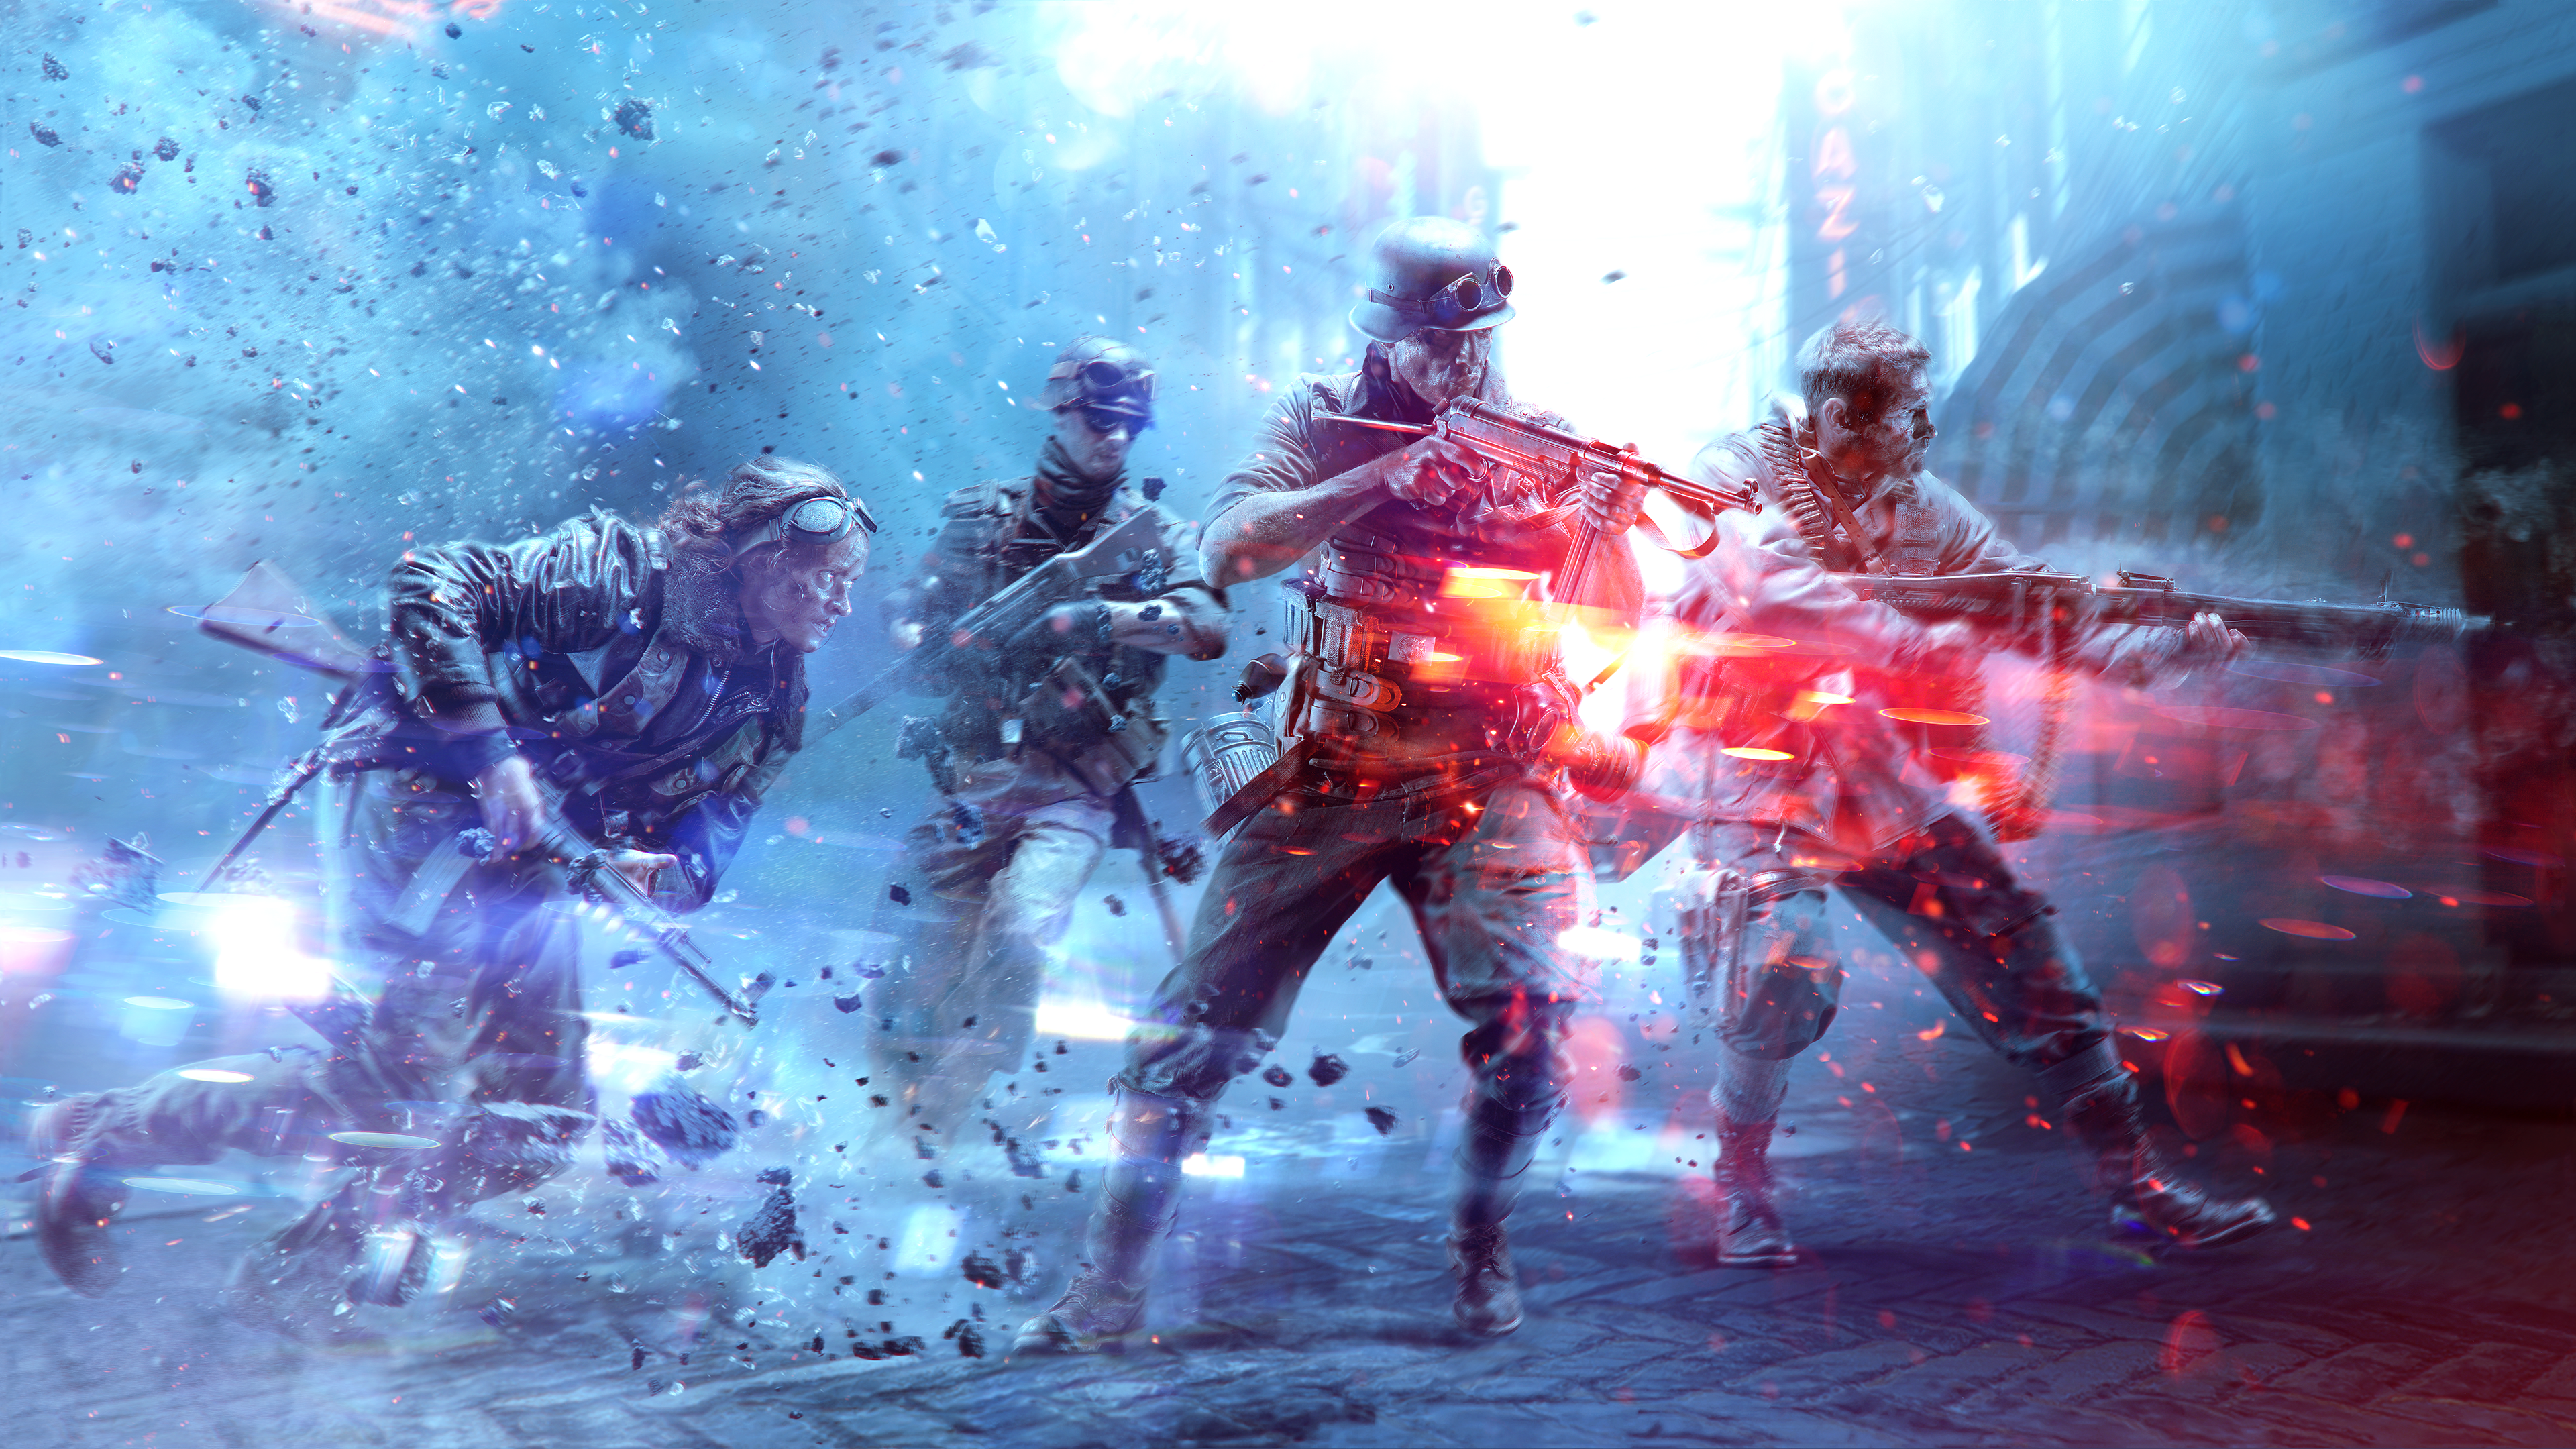 Battlefield 4k Wallpapers Top Free Battlefield 4k Backgrounds Wallpaperaccess